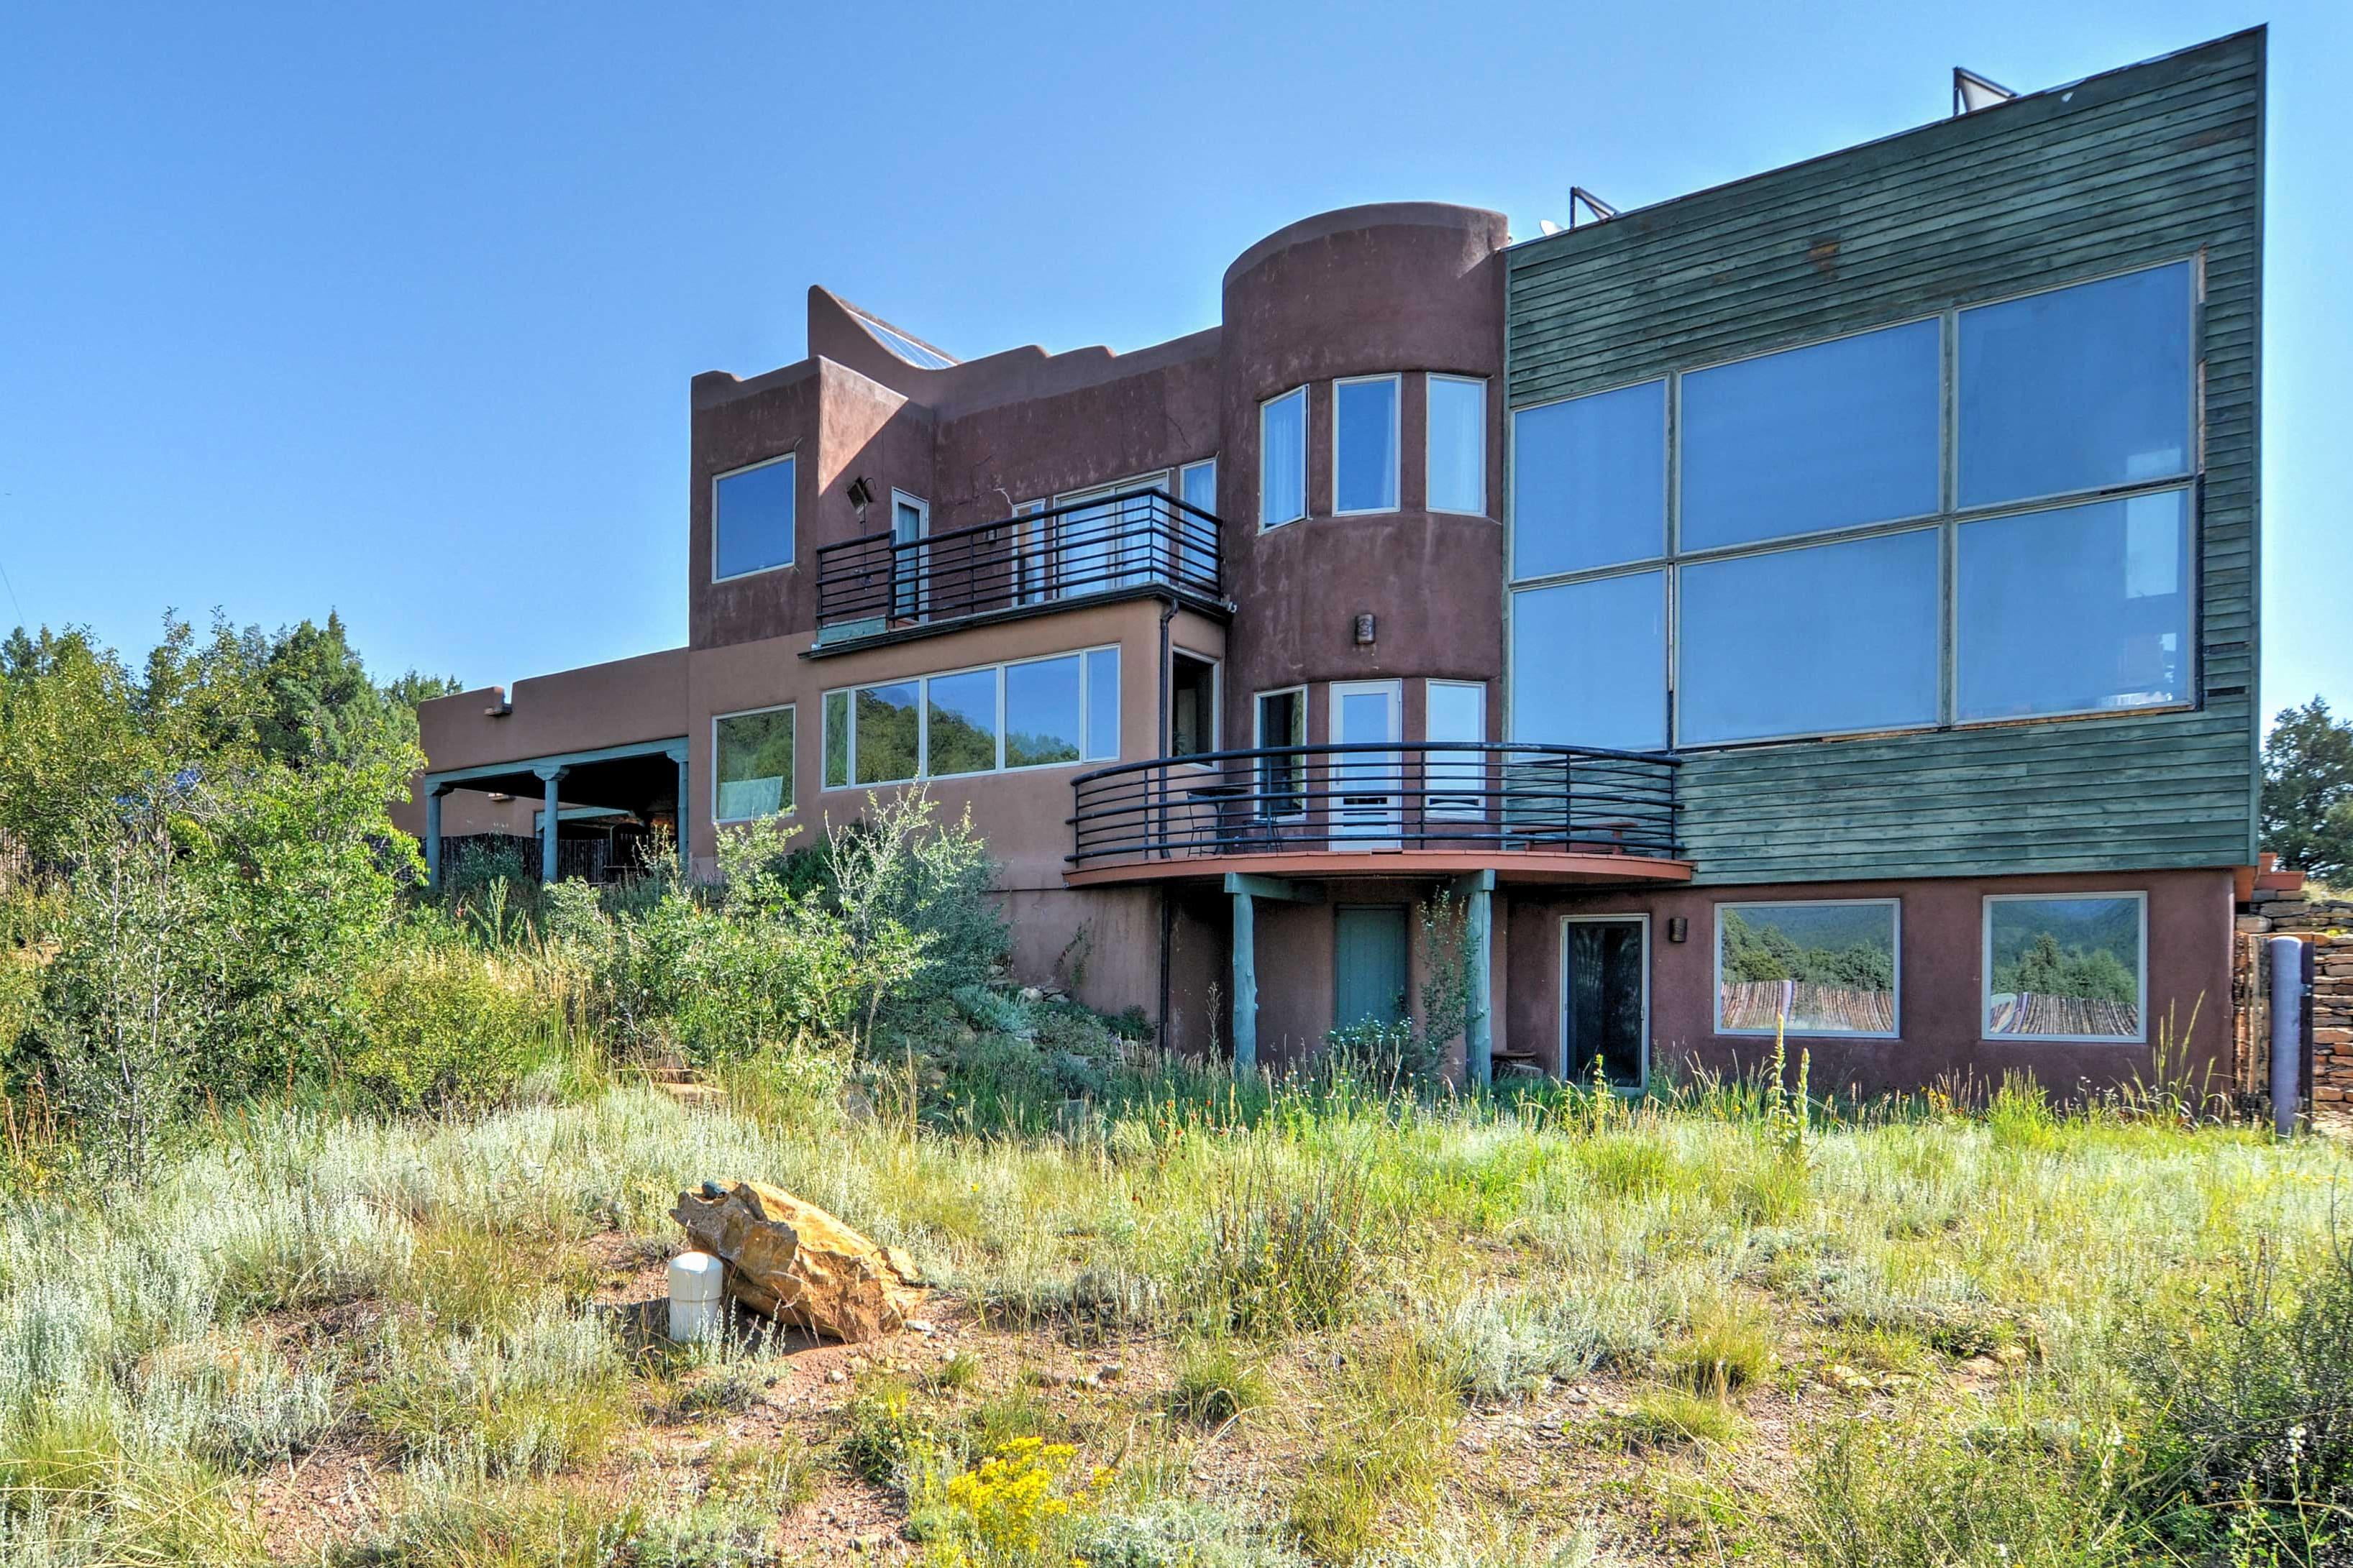 A restorative getaway awaits at this 4-bedroom, 3-bathroom vacation rental home.